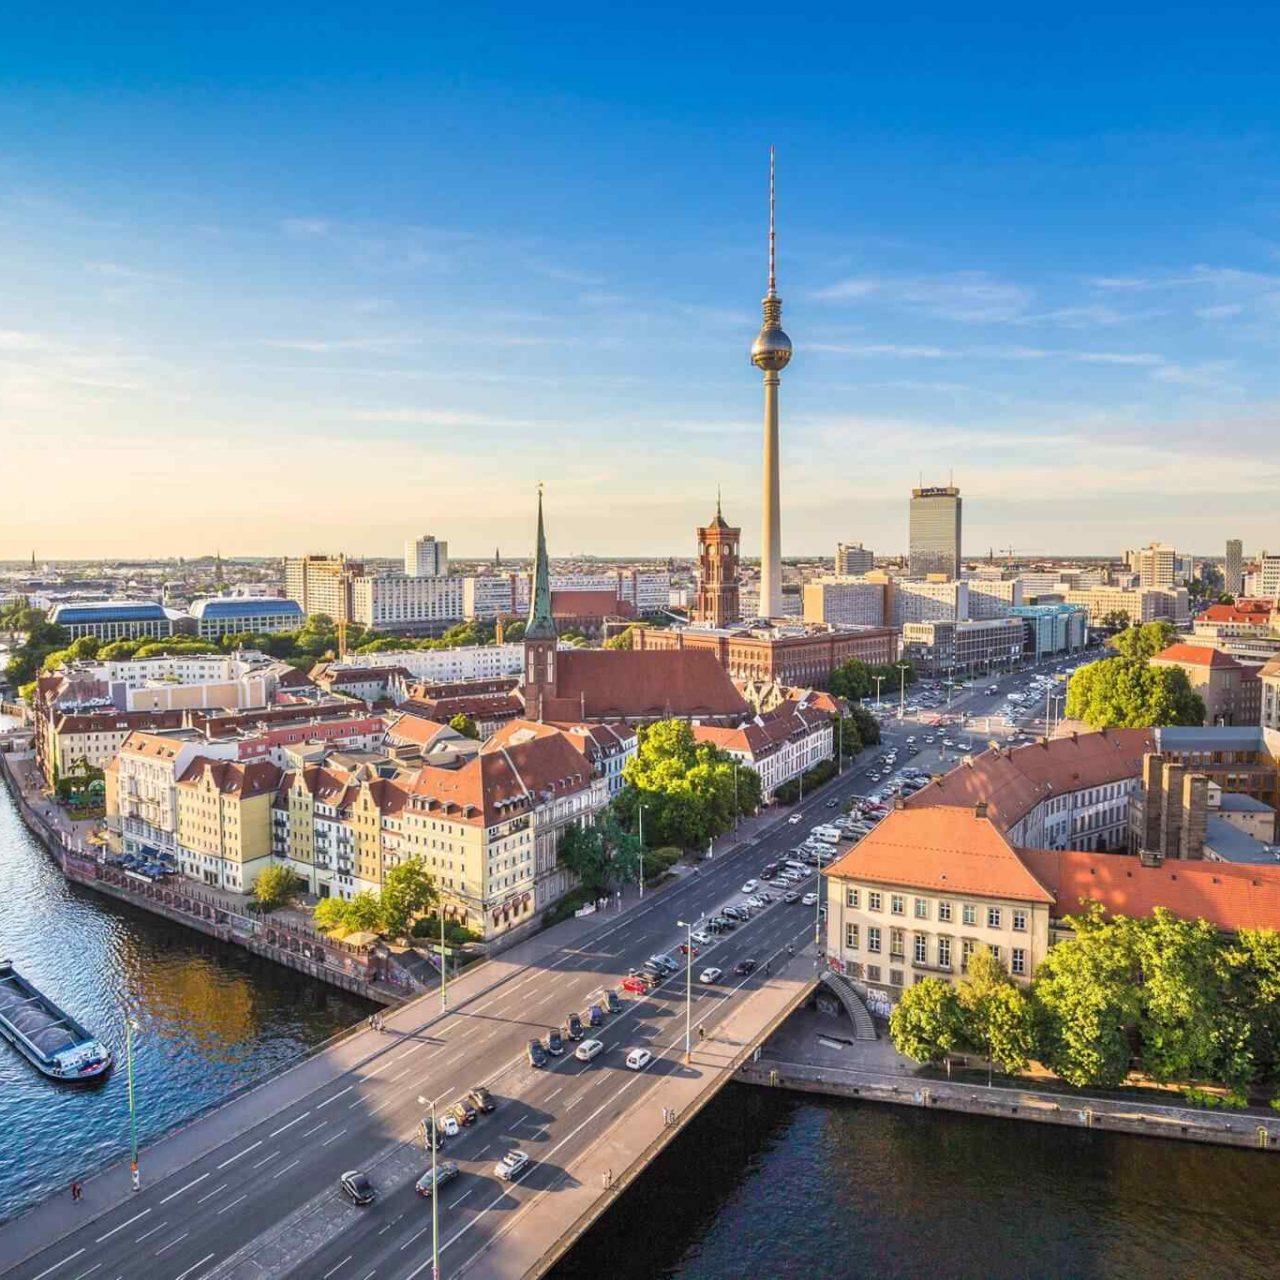 https://www.trekcentralnepal.com/wp-content/uploads/2018/09/destination-berlin-05-1280x1280.jpg